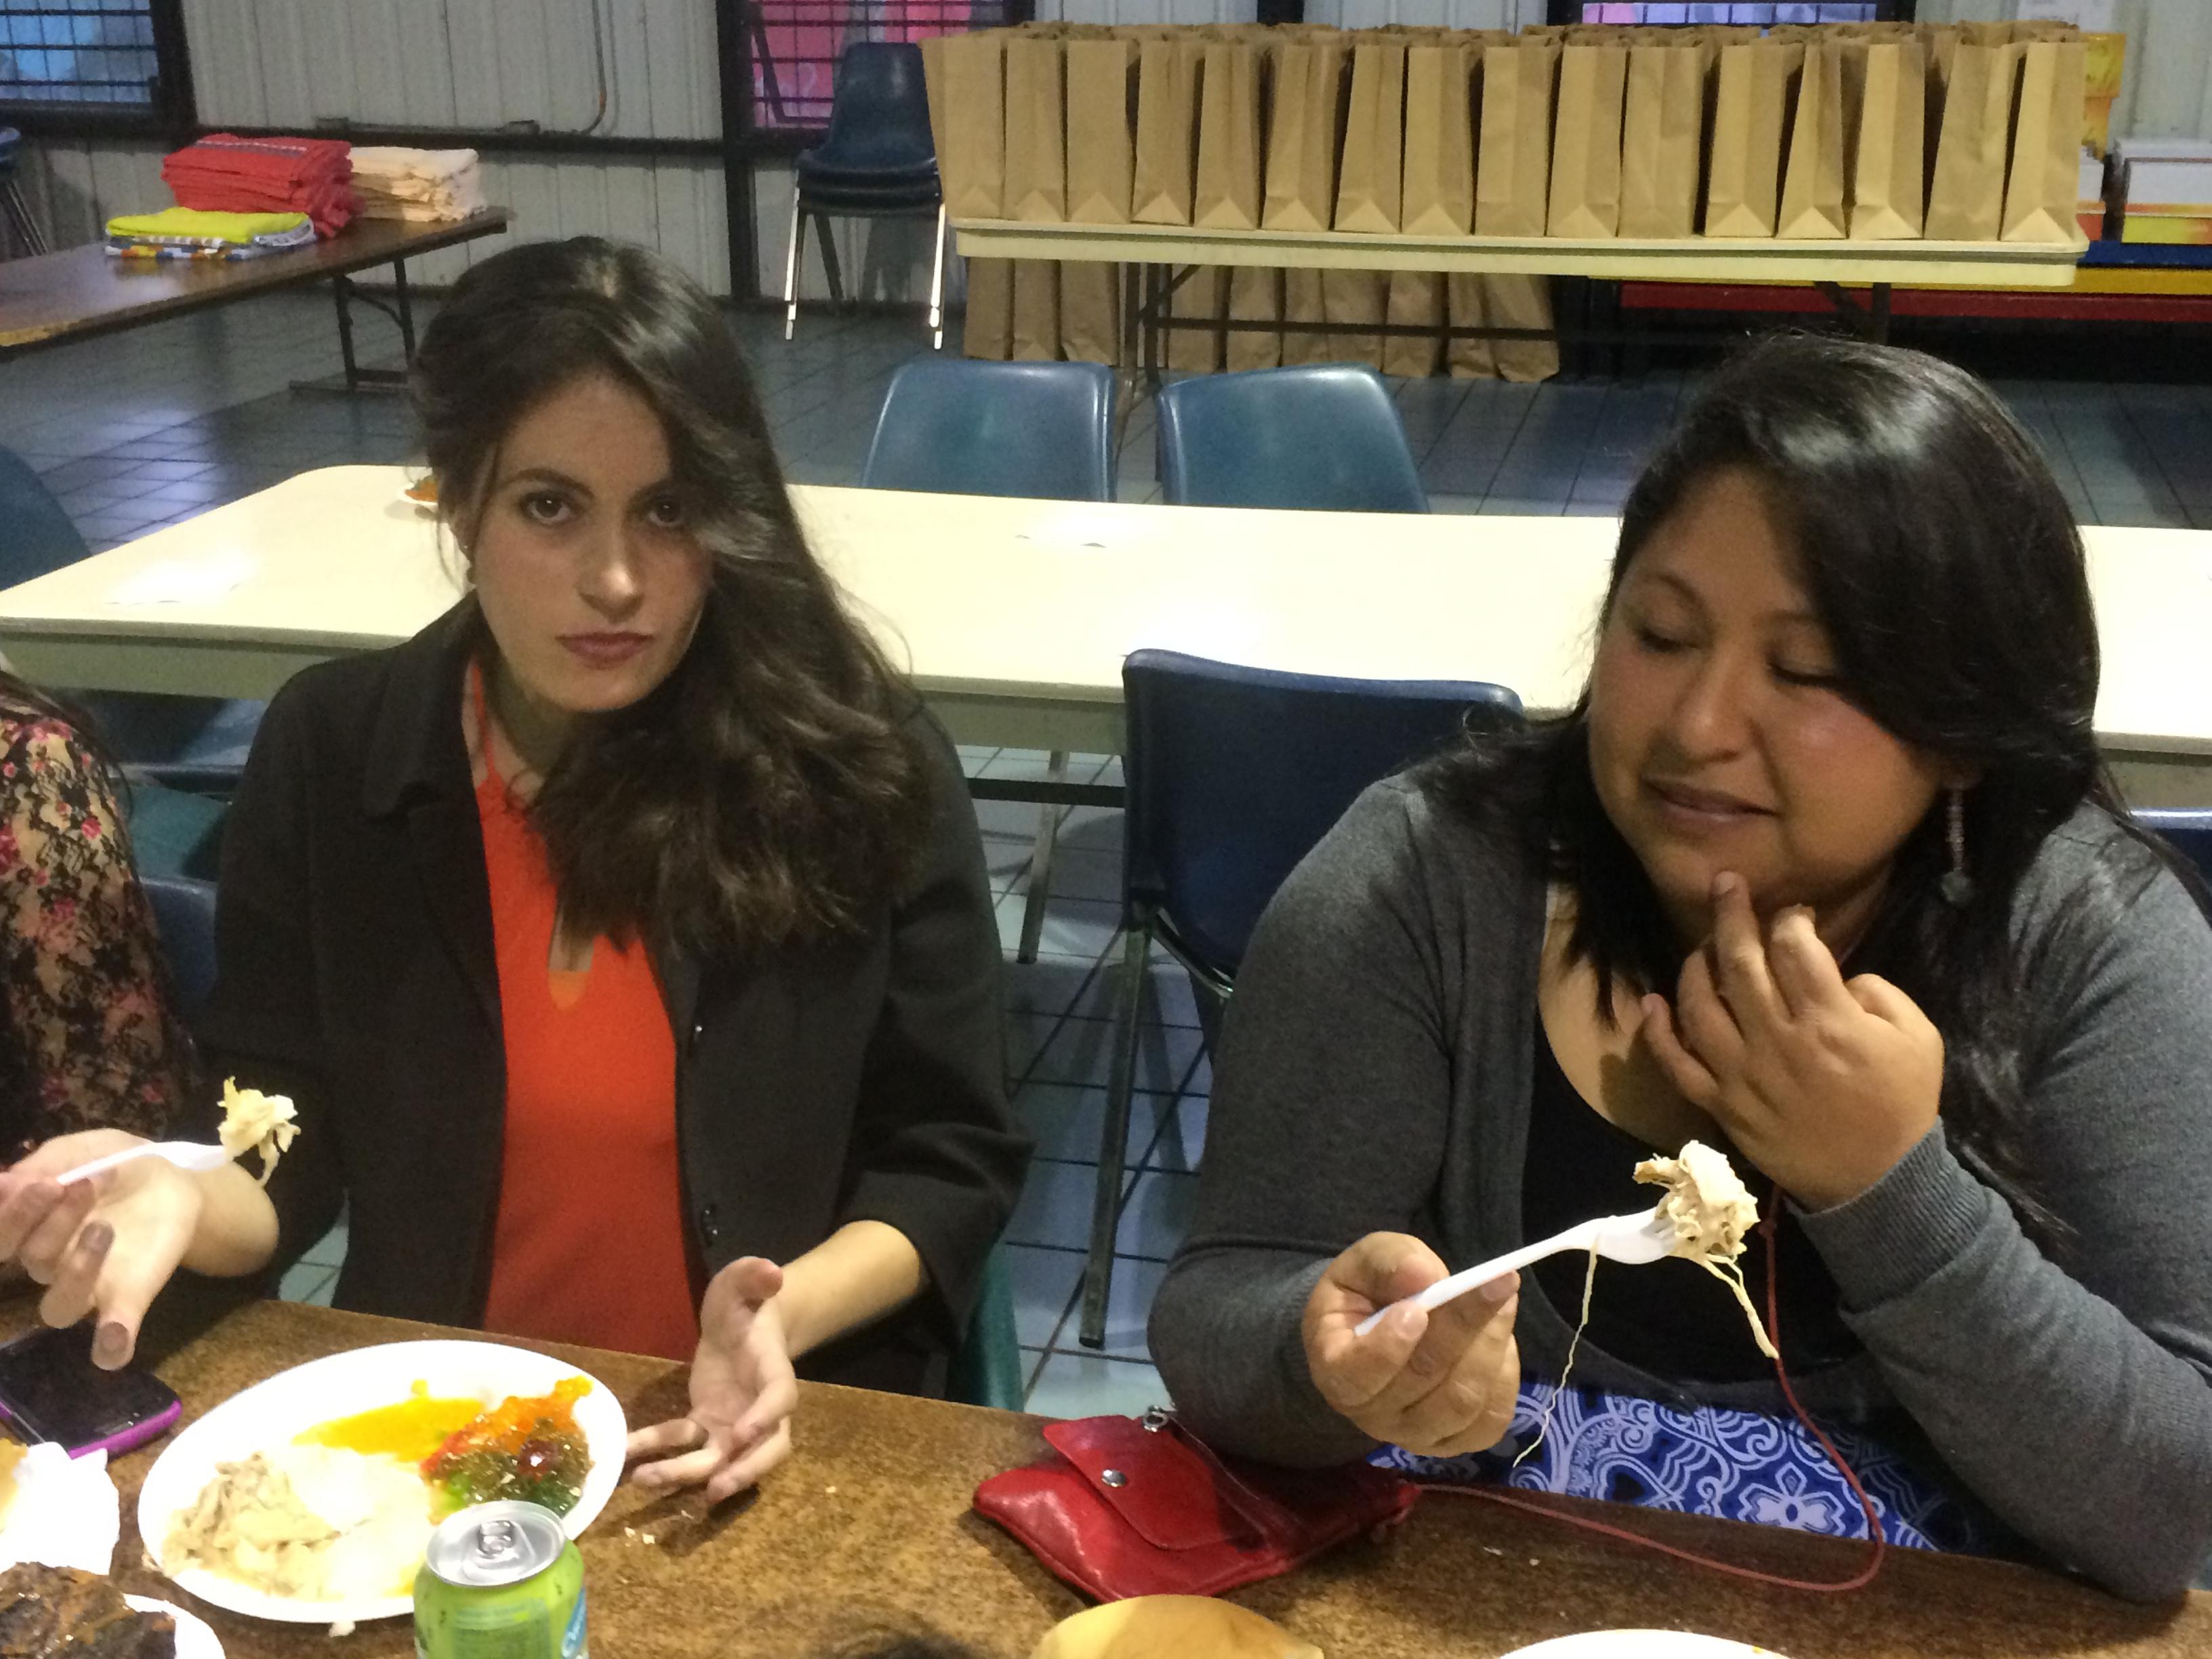 Marlin and Analy enjoying the turkey